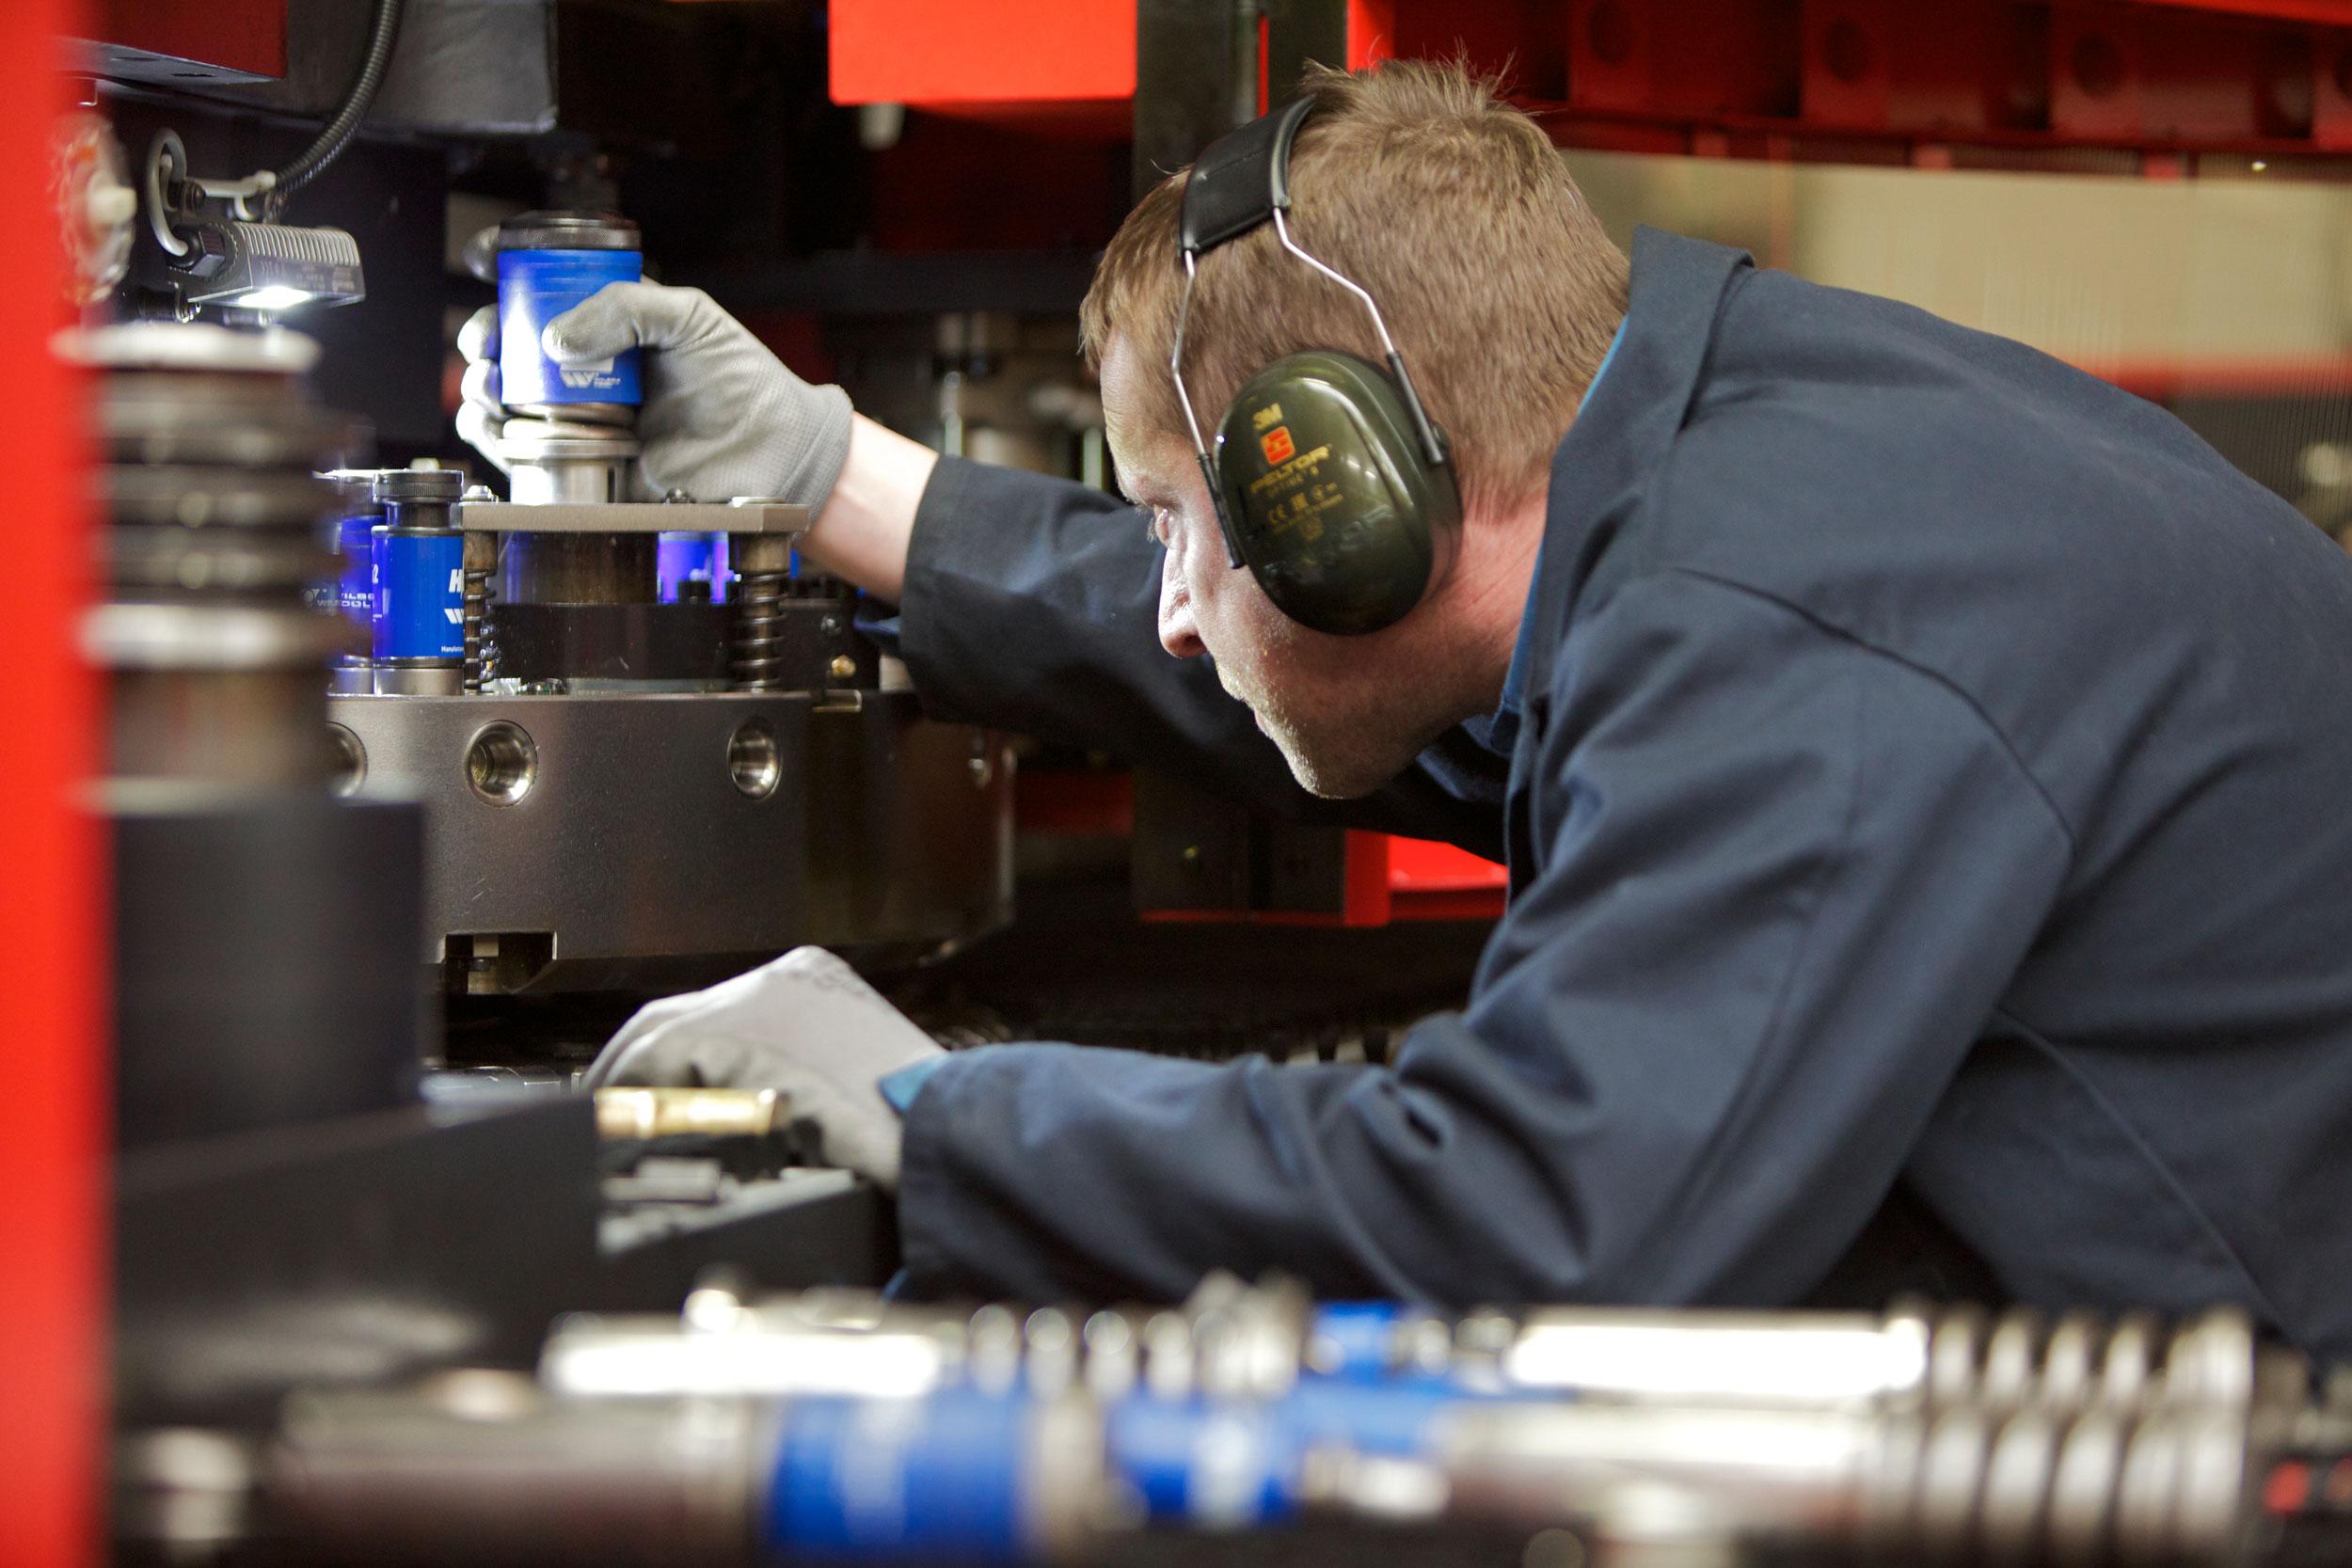 IDT PRECISION ENGINEERING